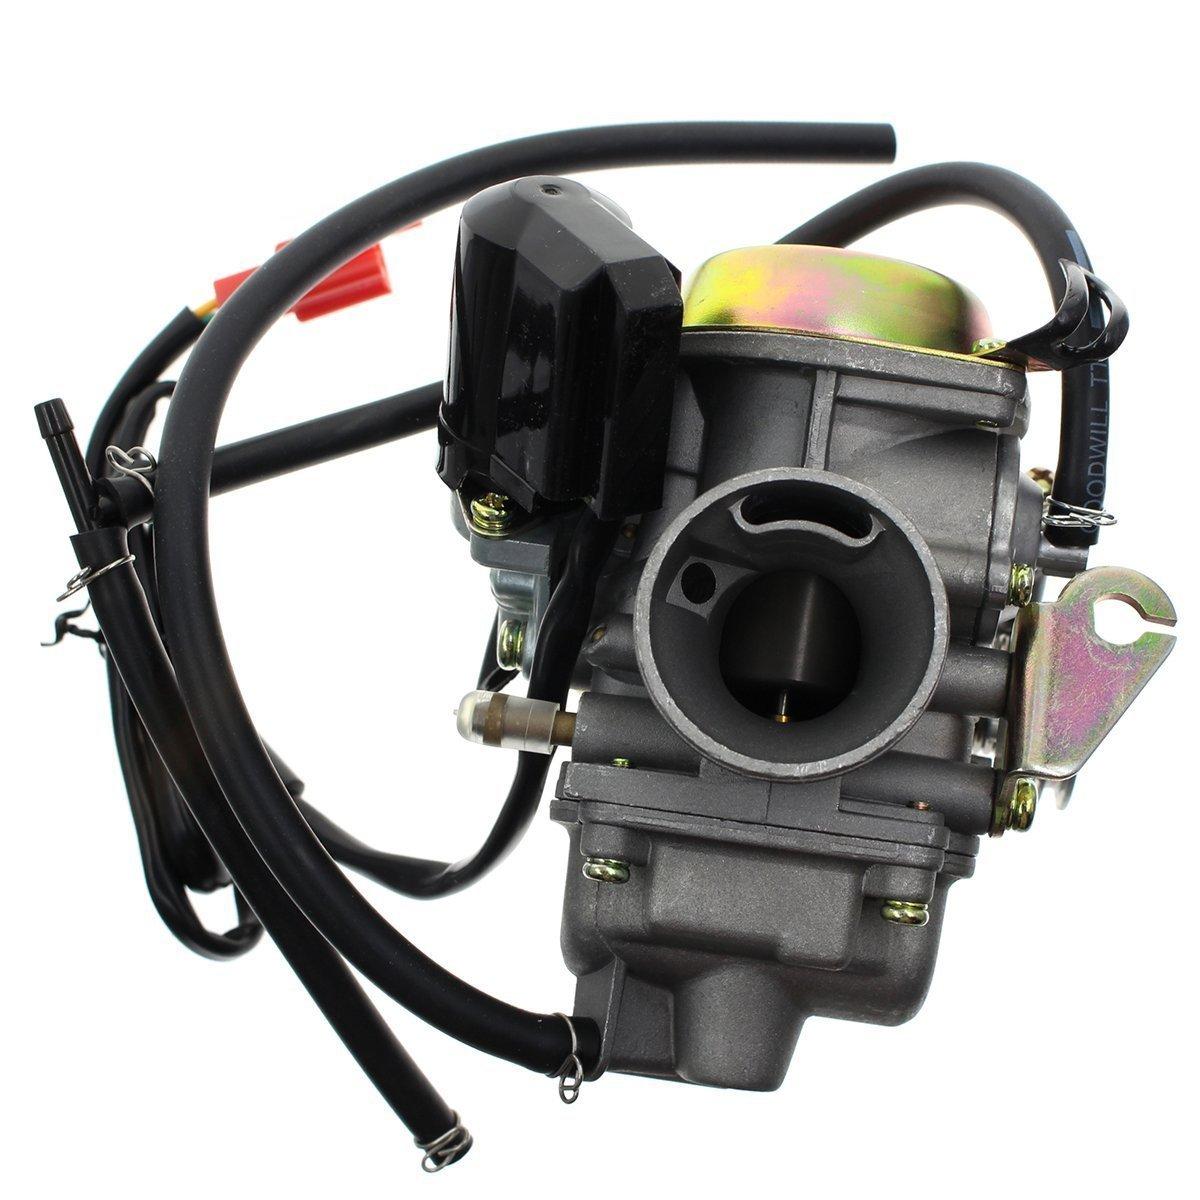 Lumix GC Voltage Regulator Rectifier For Kandi KD-150FS KD-150GK Go Kart 150cc